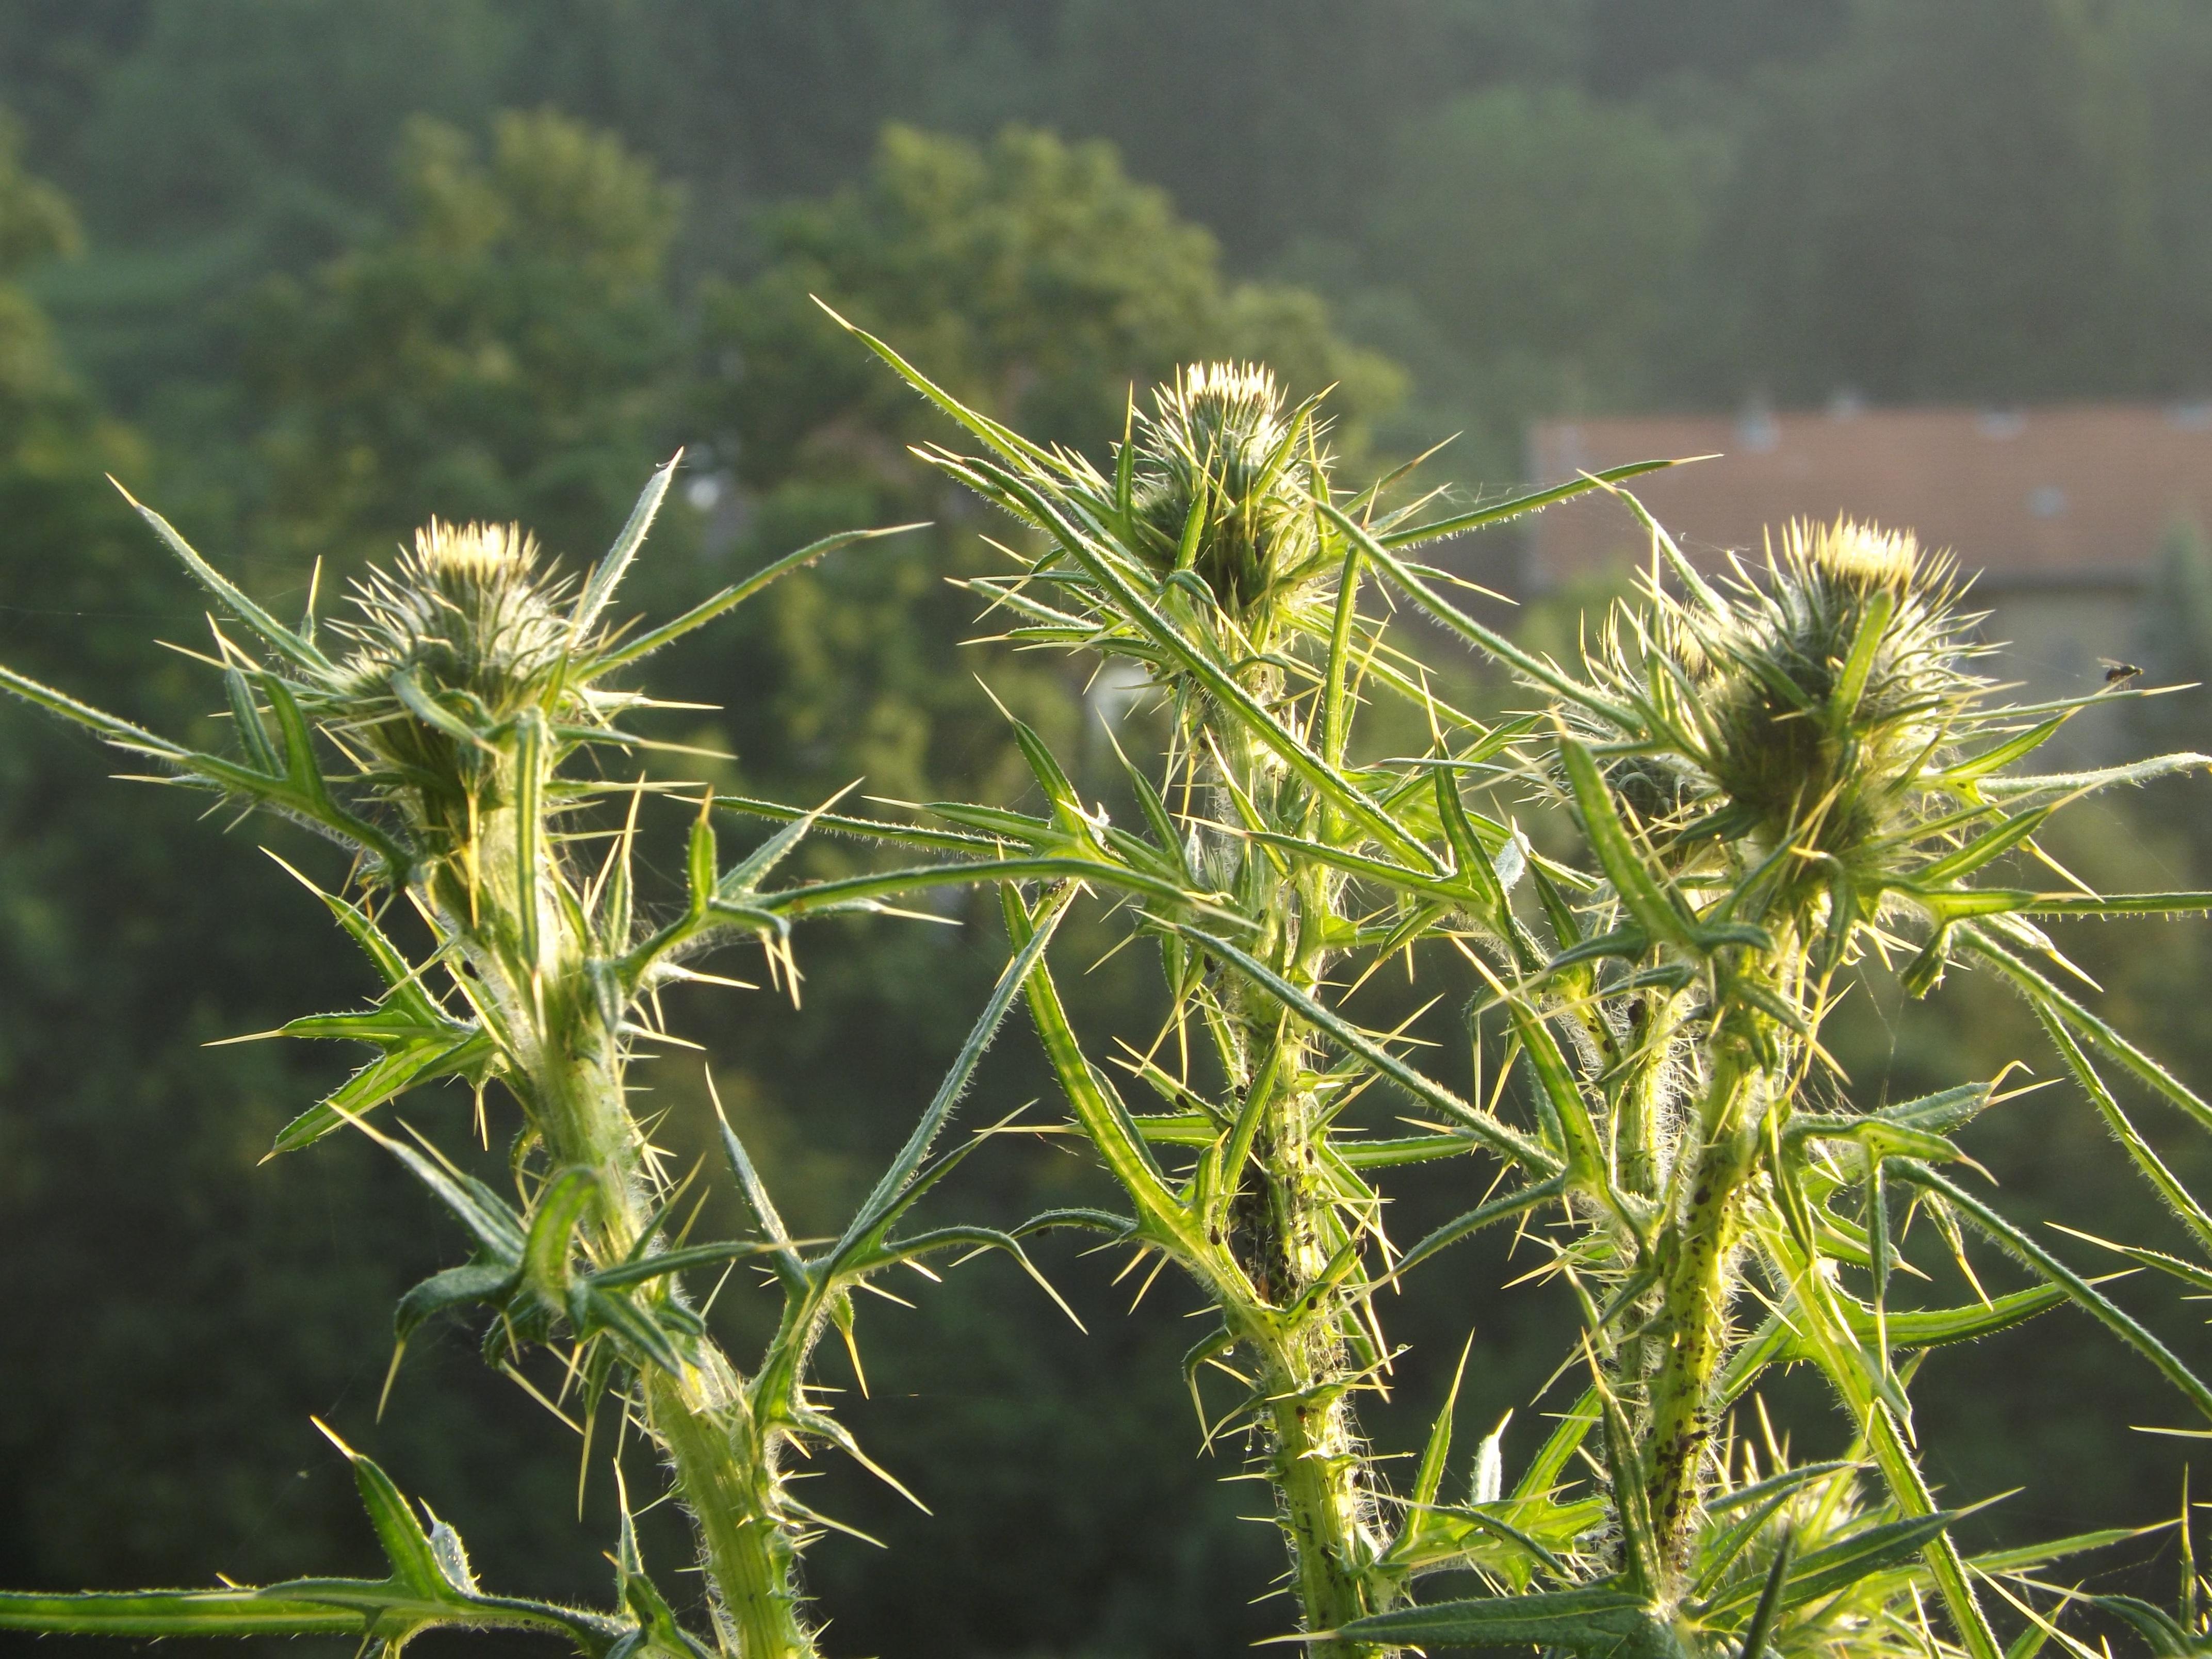 Images Gratuites Herbe Epineux Prairie Prairie Fleur Vert